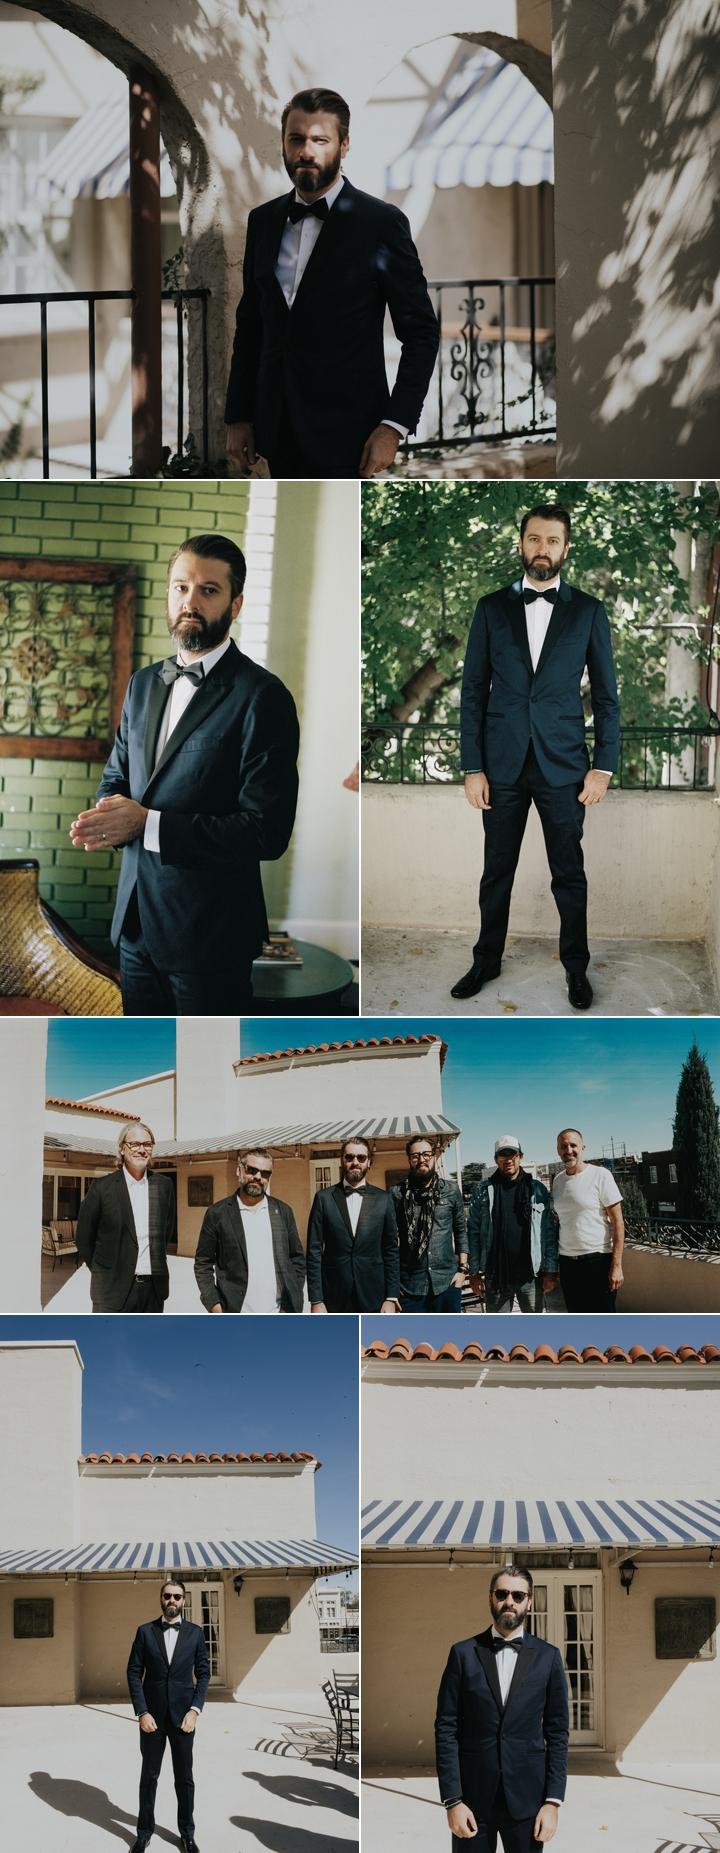 marfa-texas-weddings-photographers 17.jpg